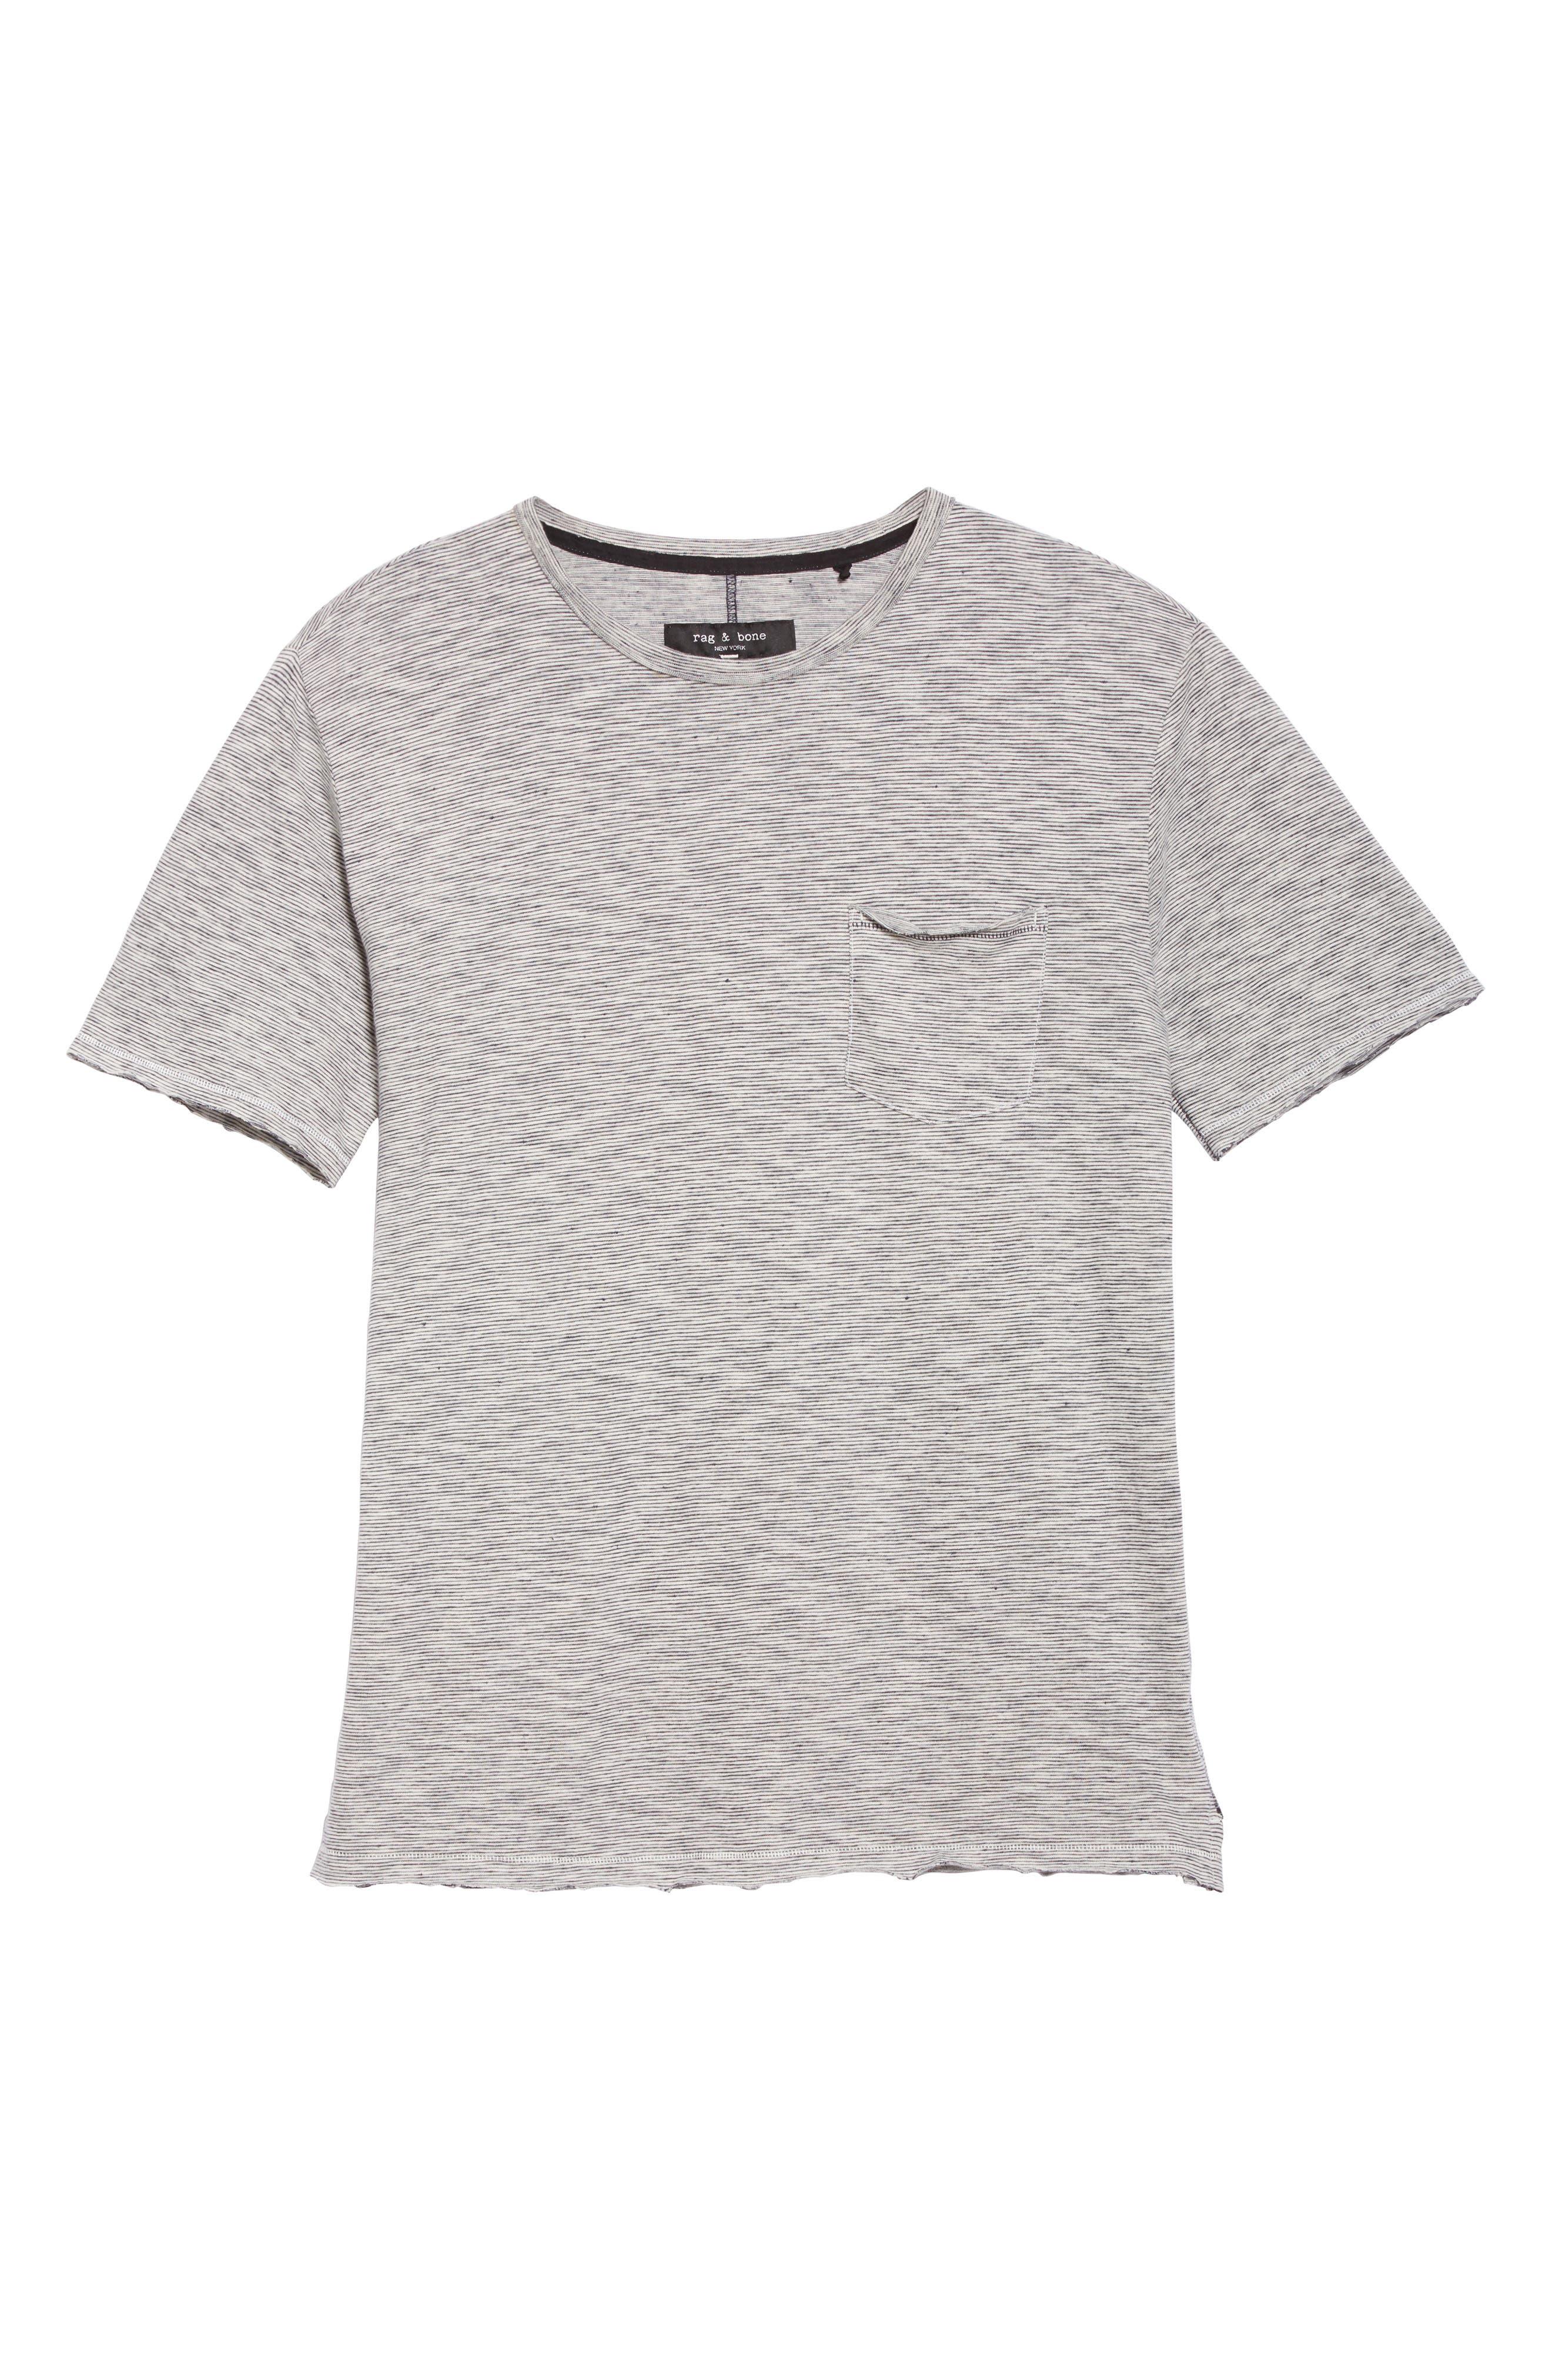 Owen Pocket T-Shirt,                             Alternate thumbnail 17, color,